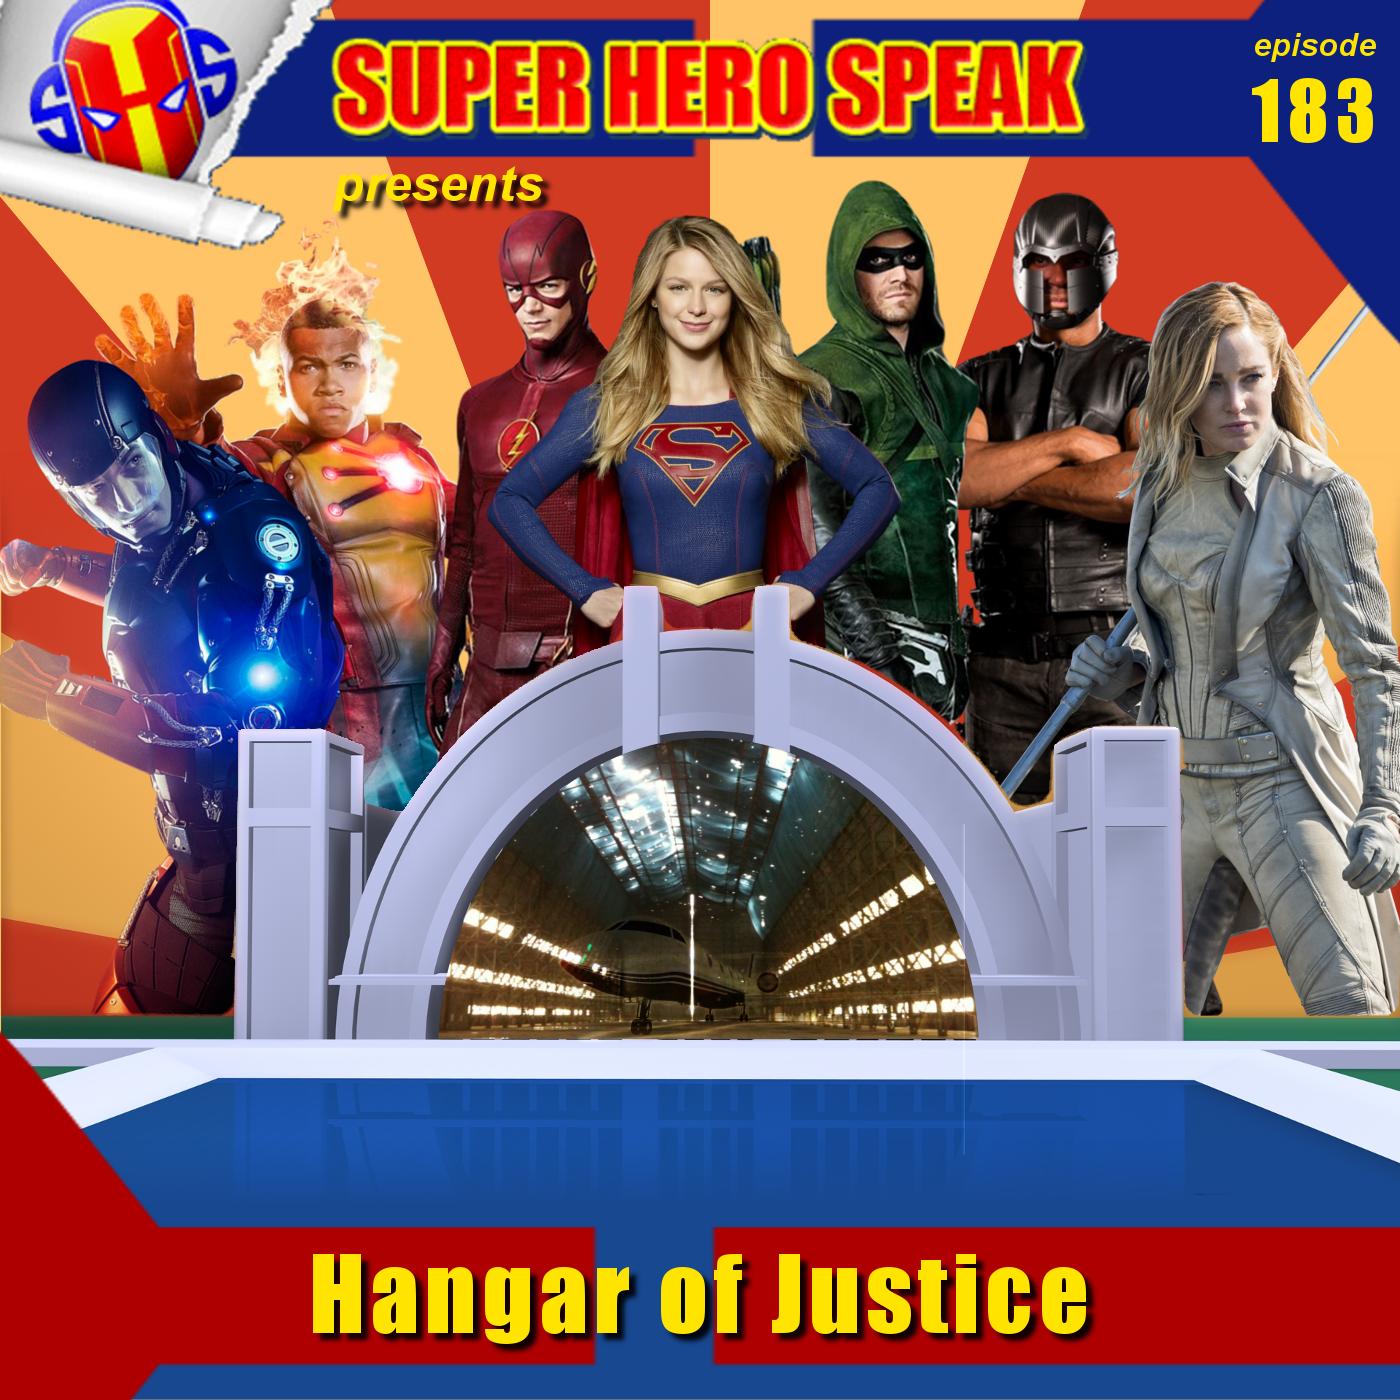 #183: Hangar of Justice